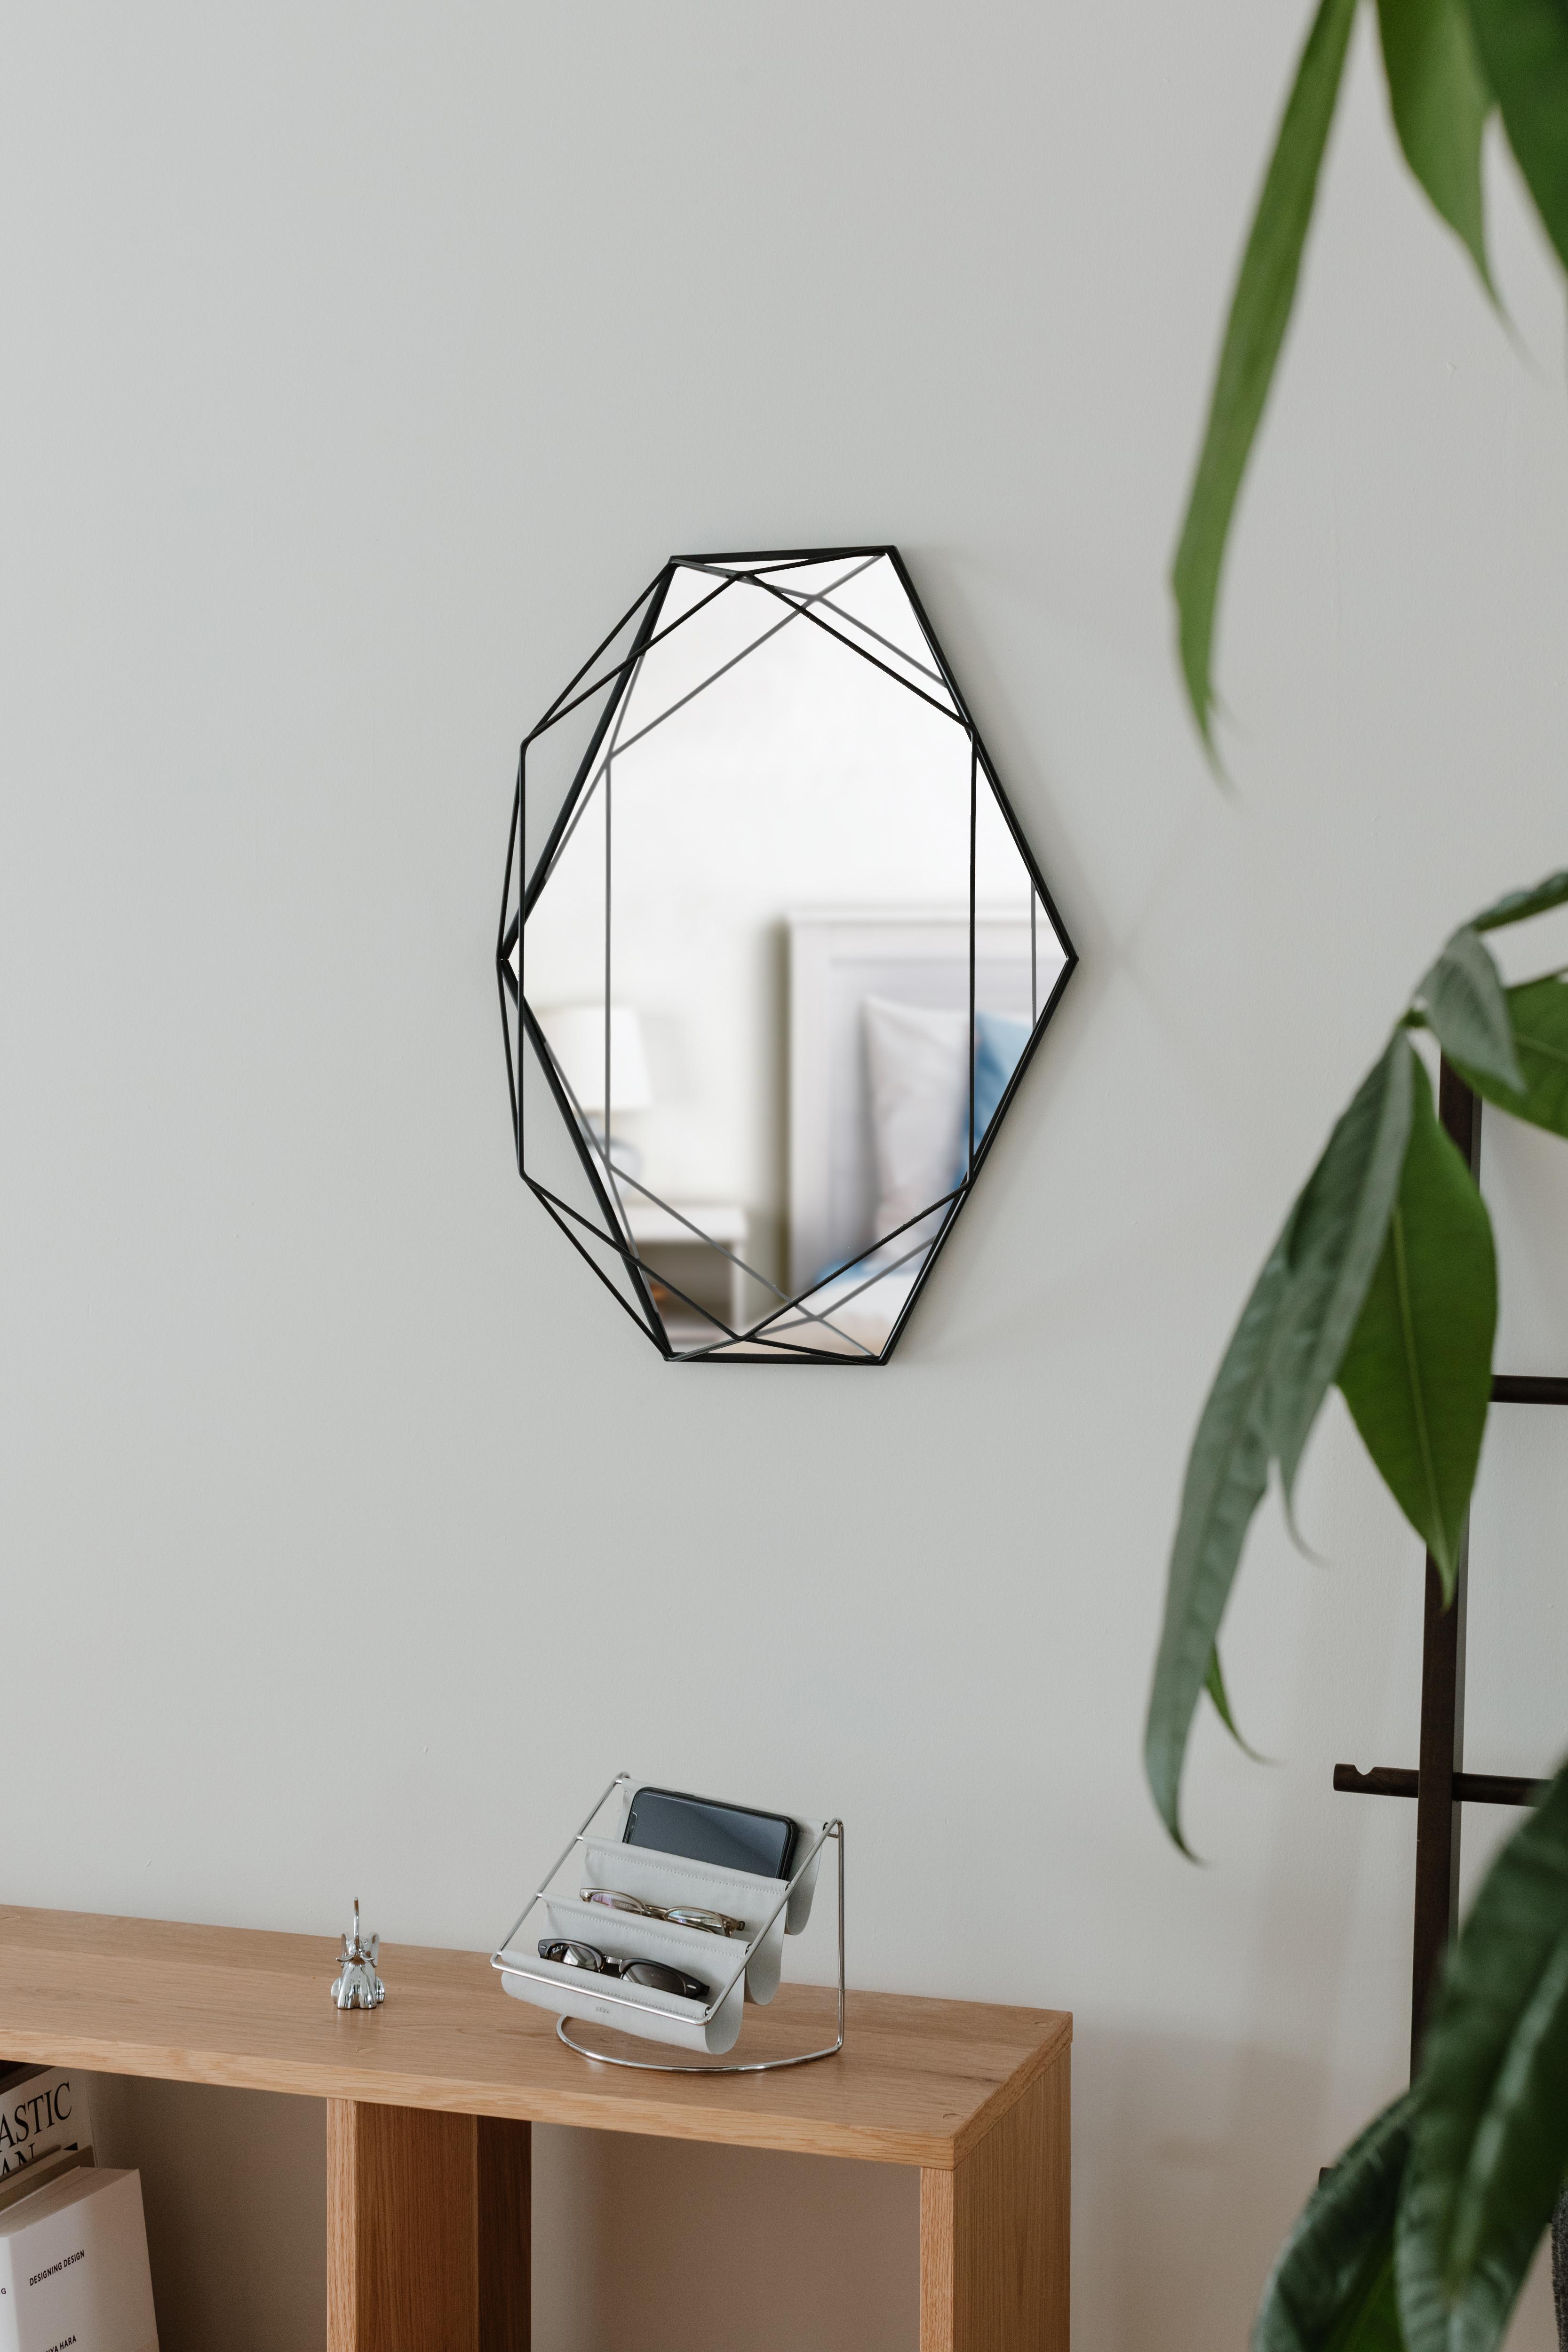 Miroir mural structure filaire métal noir